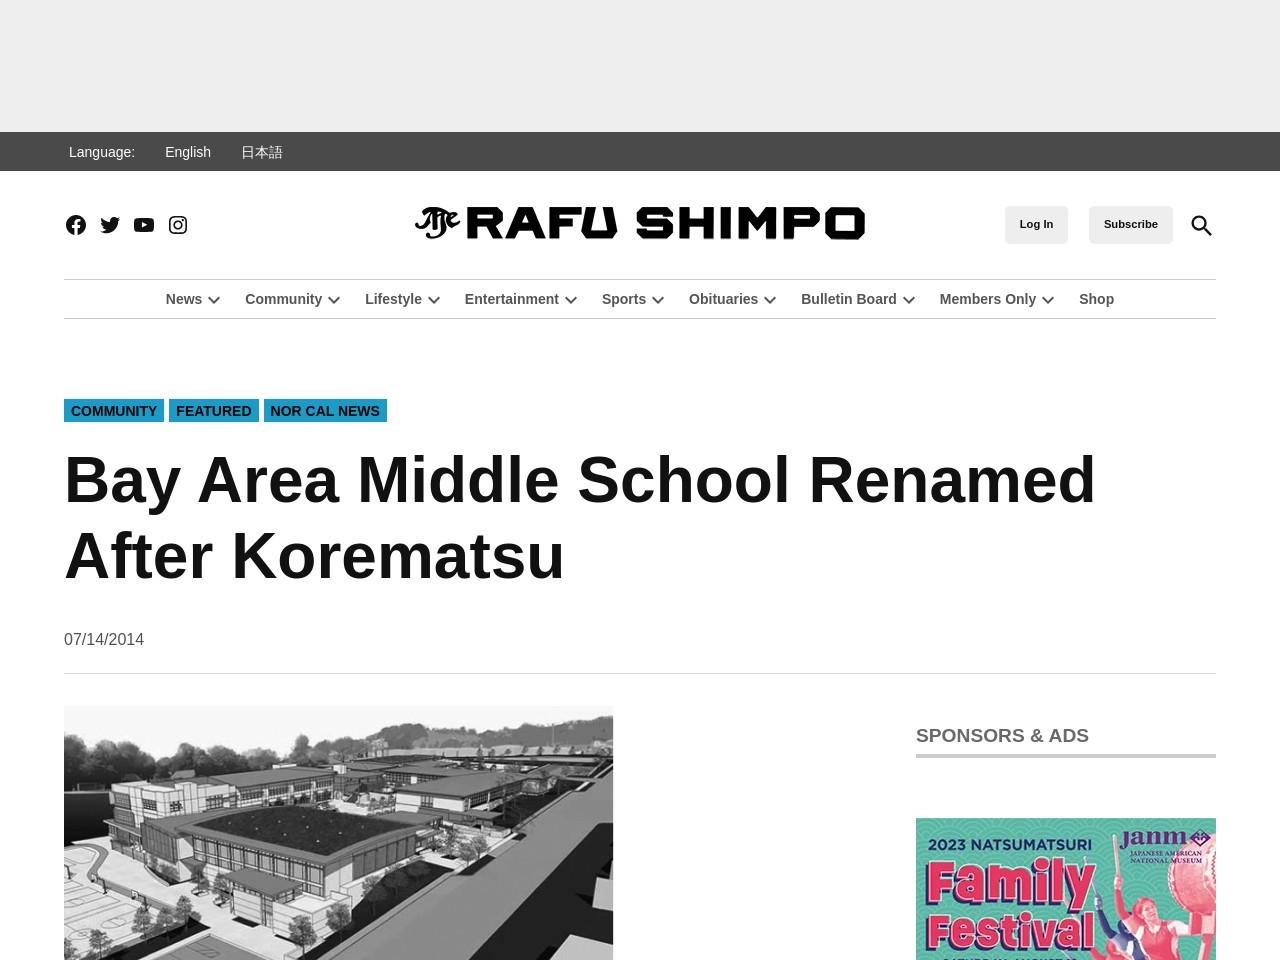 Bay Area Middle School Renamed After Korematsu